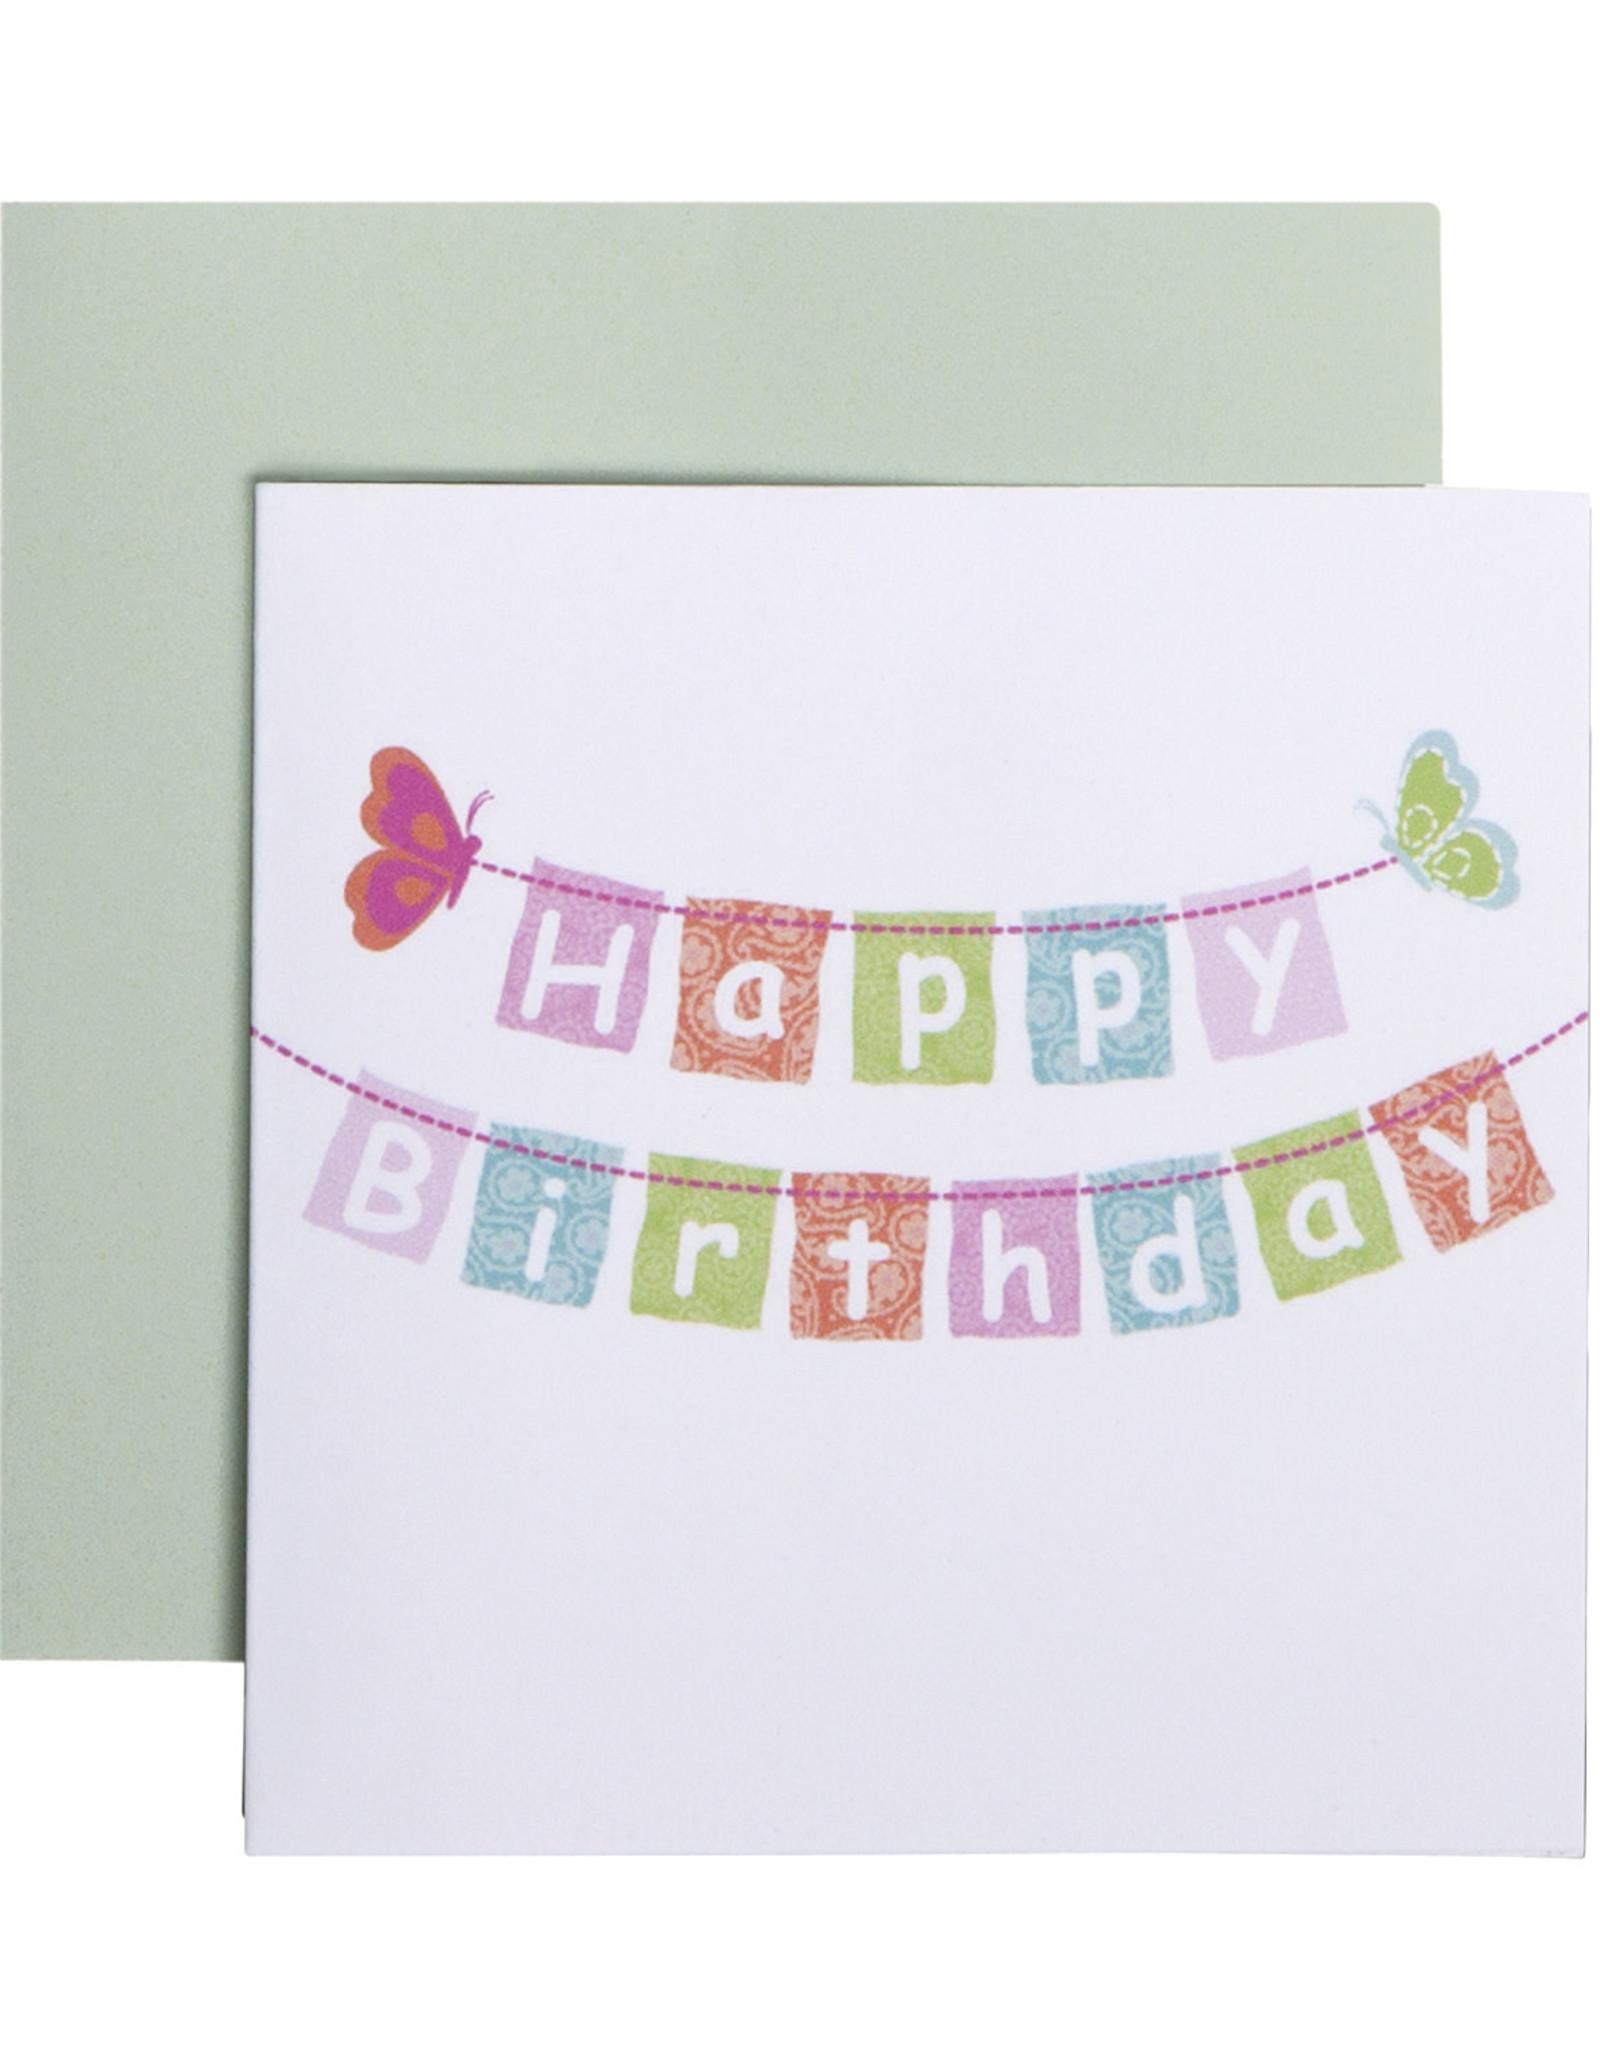 Mini Enclosure Card - Happy Birthday